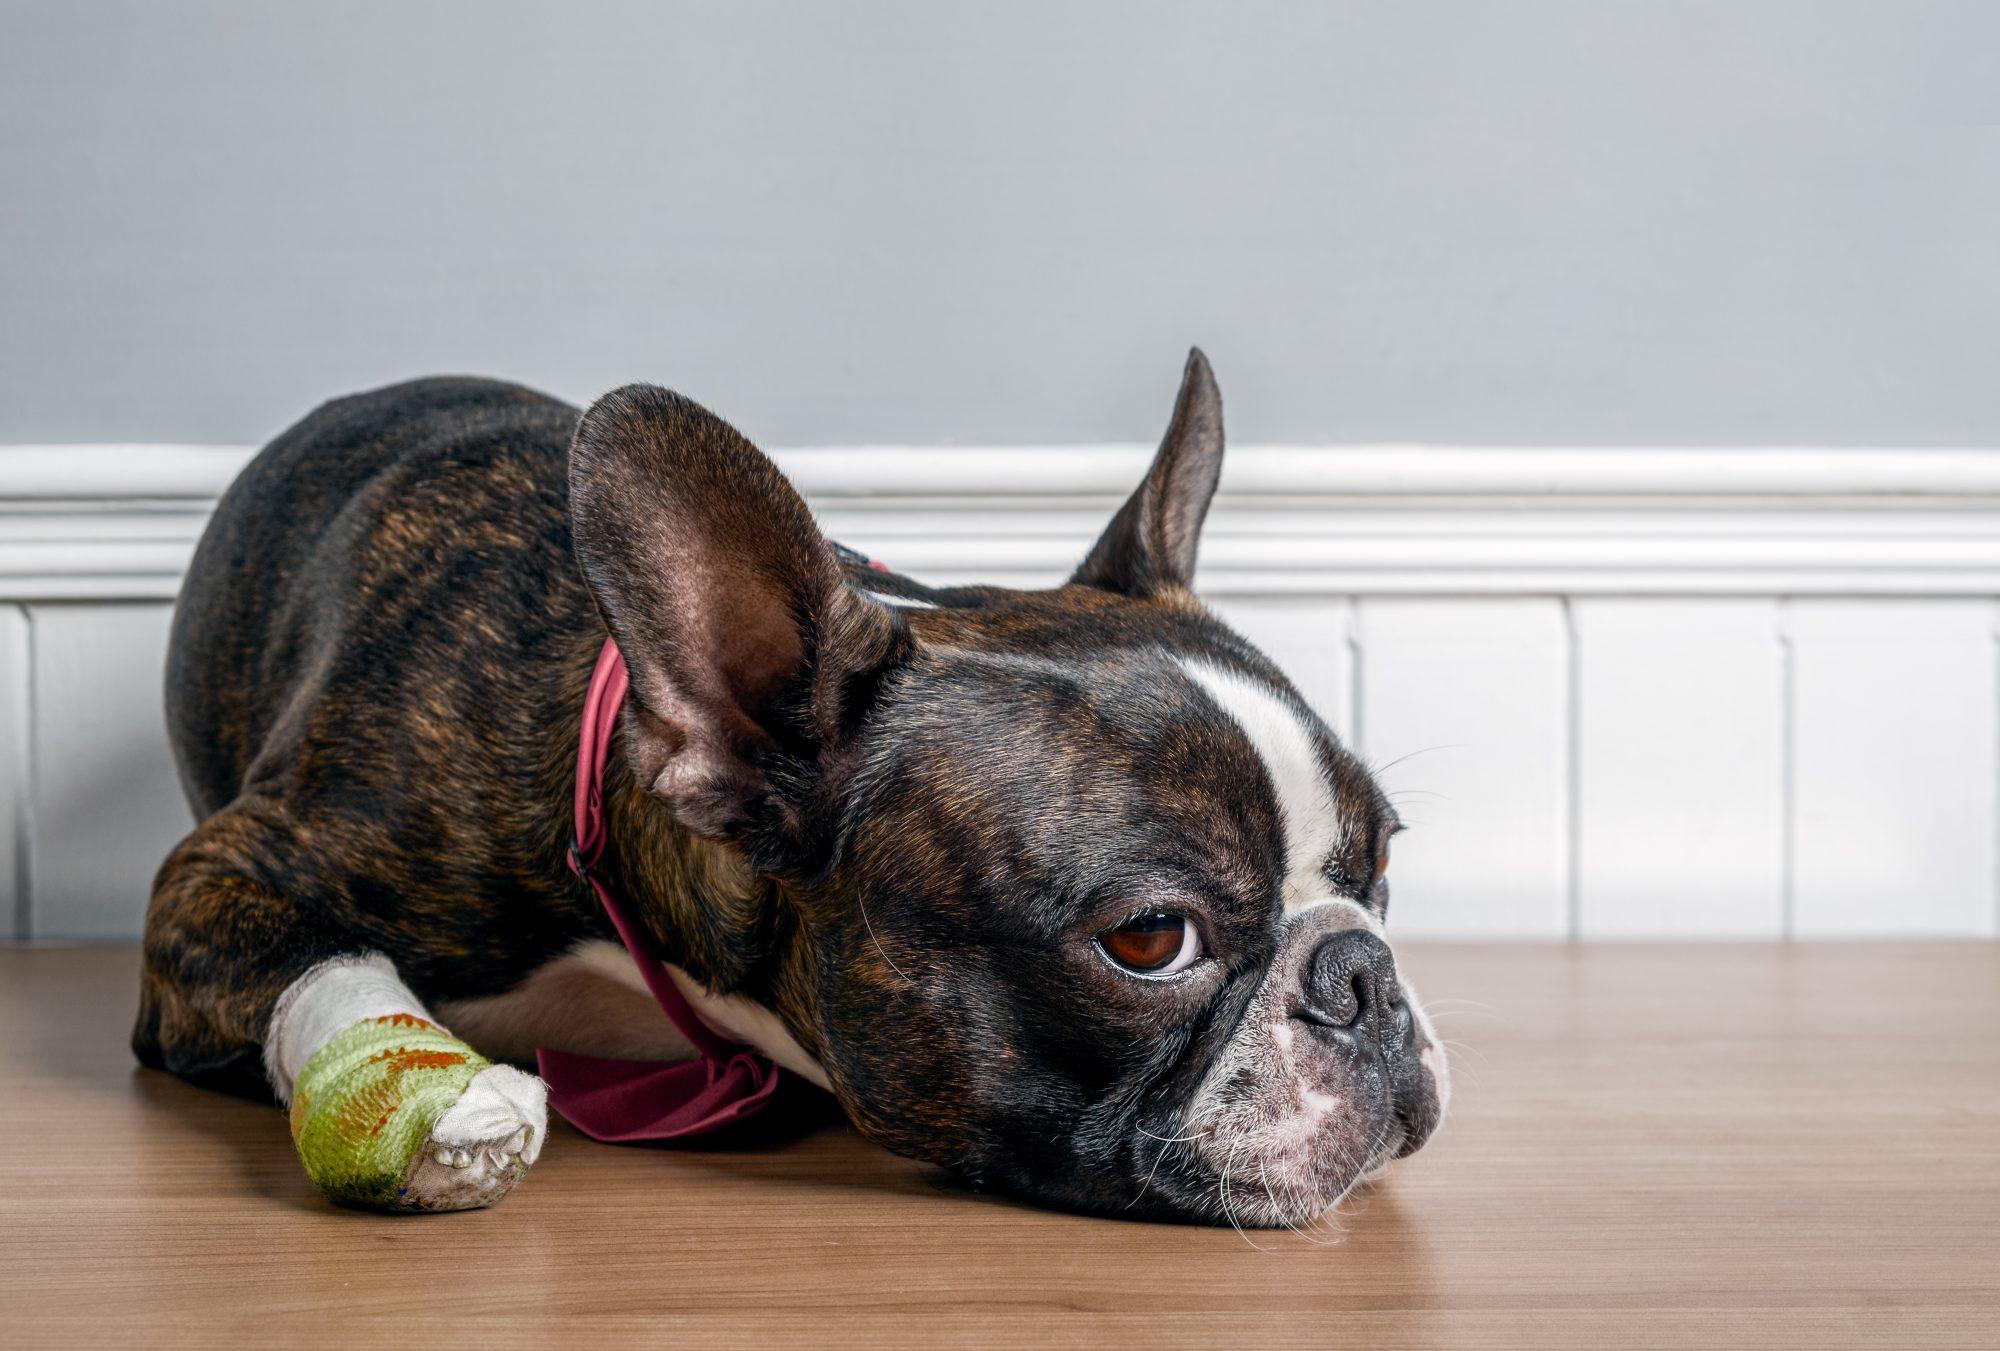 A dog with a bandaged paw.